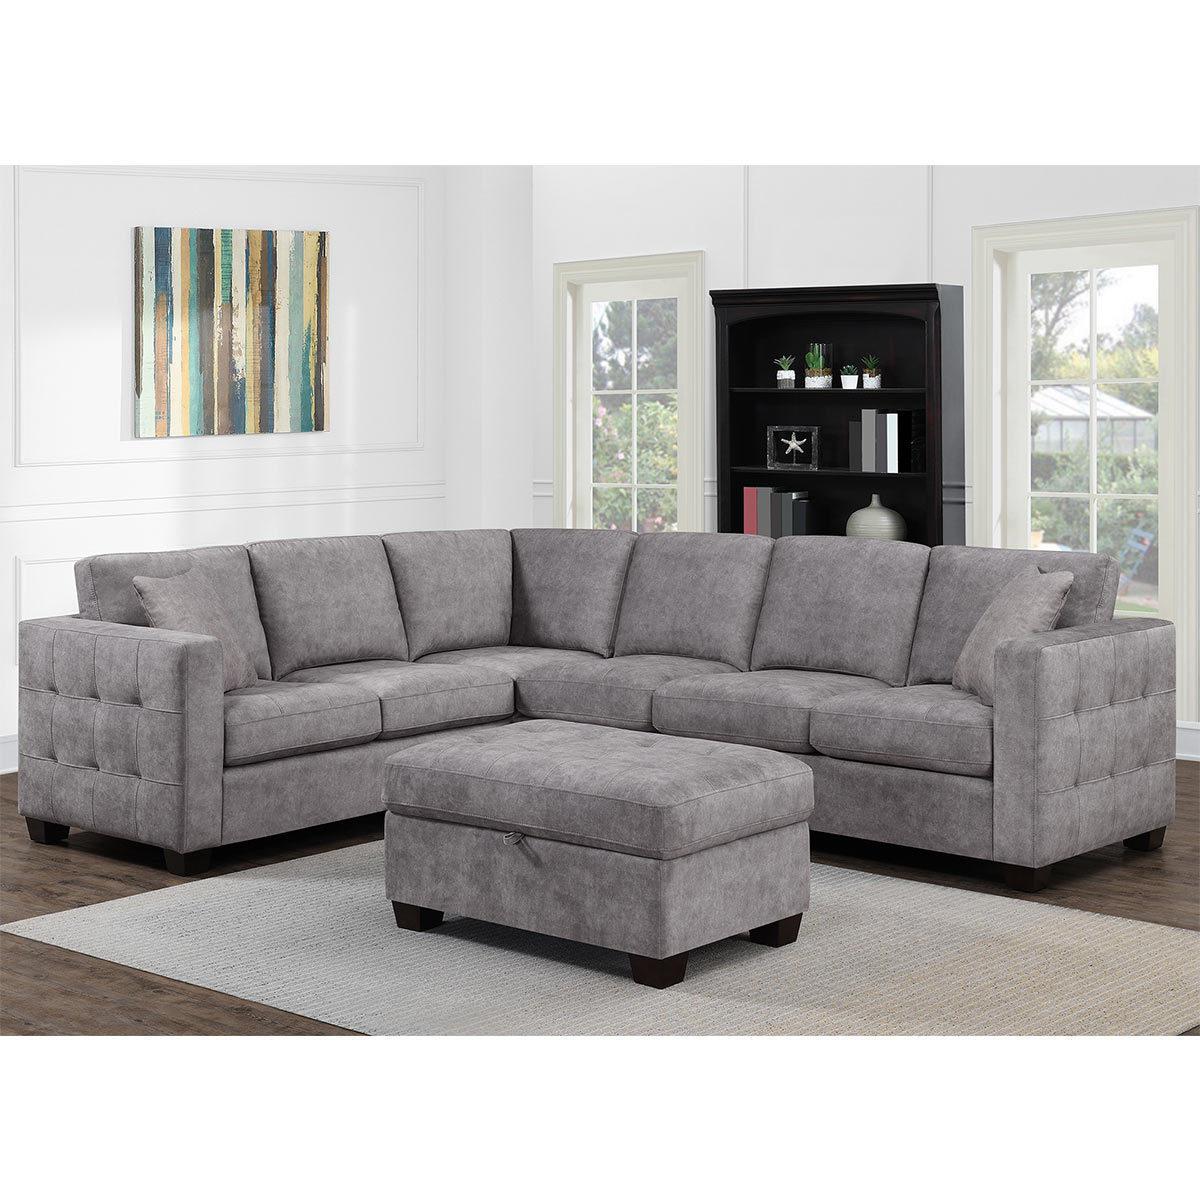 thomasville kylie grey fabric corner sofa with storage ottoman costco uk